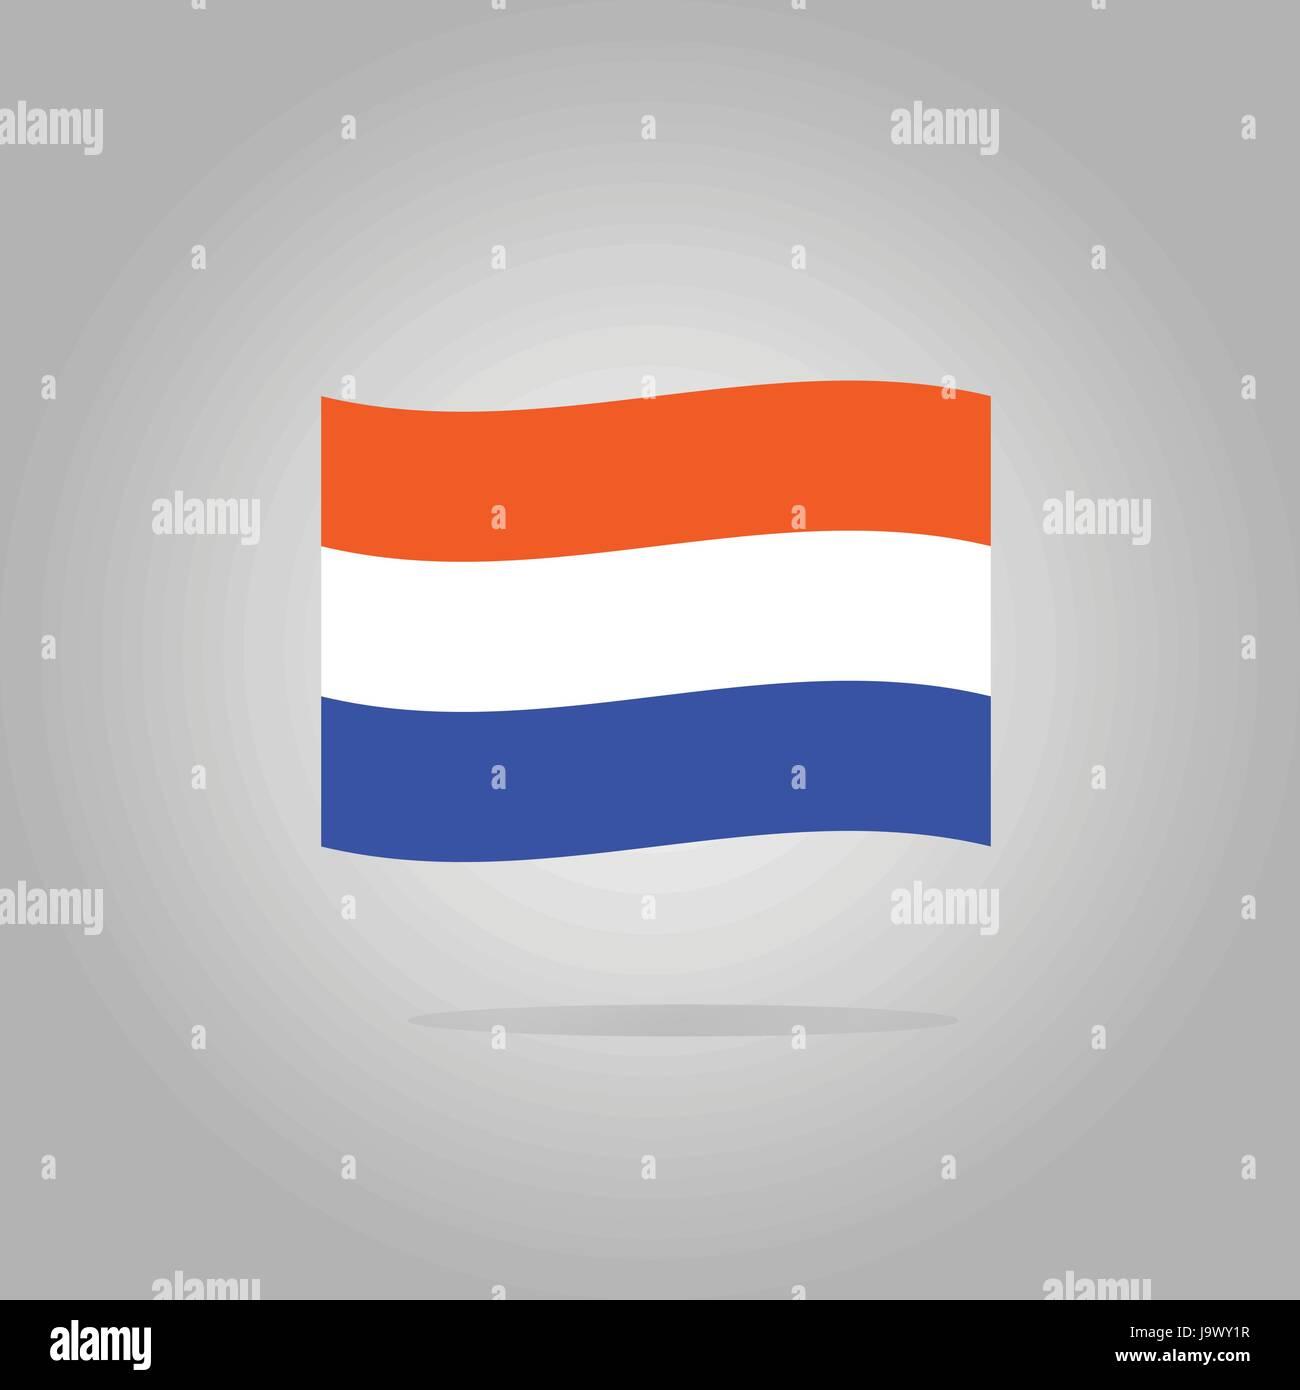 Netherlands flag design illustration - Stock Vector